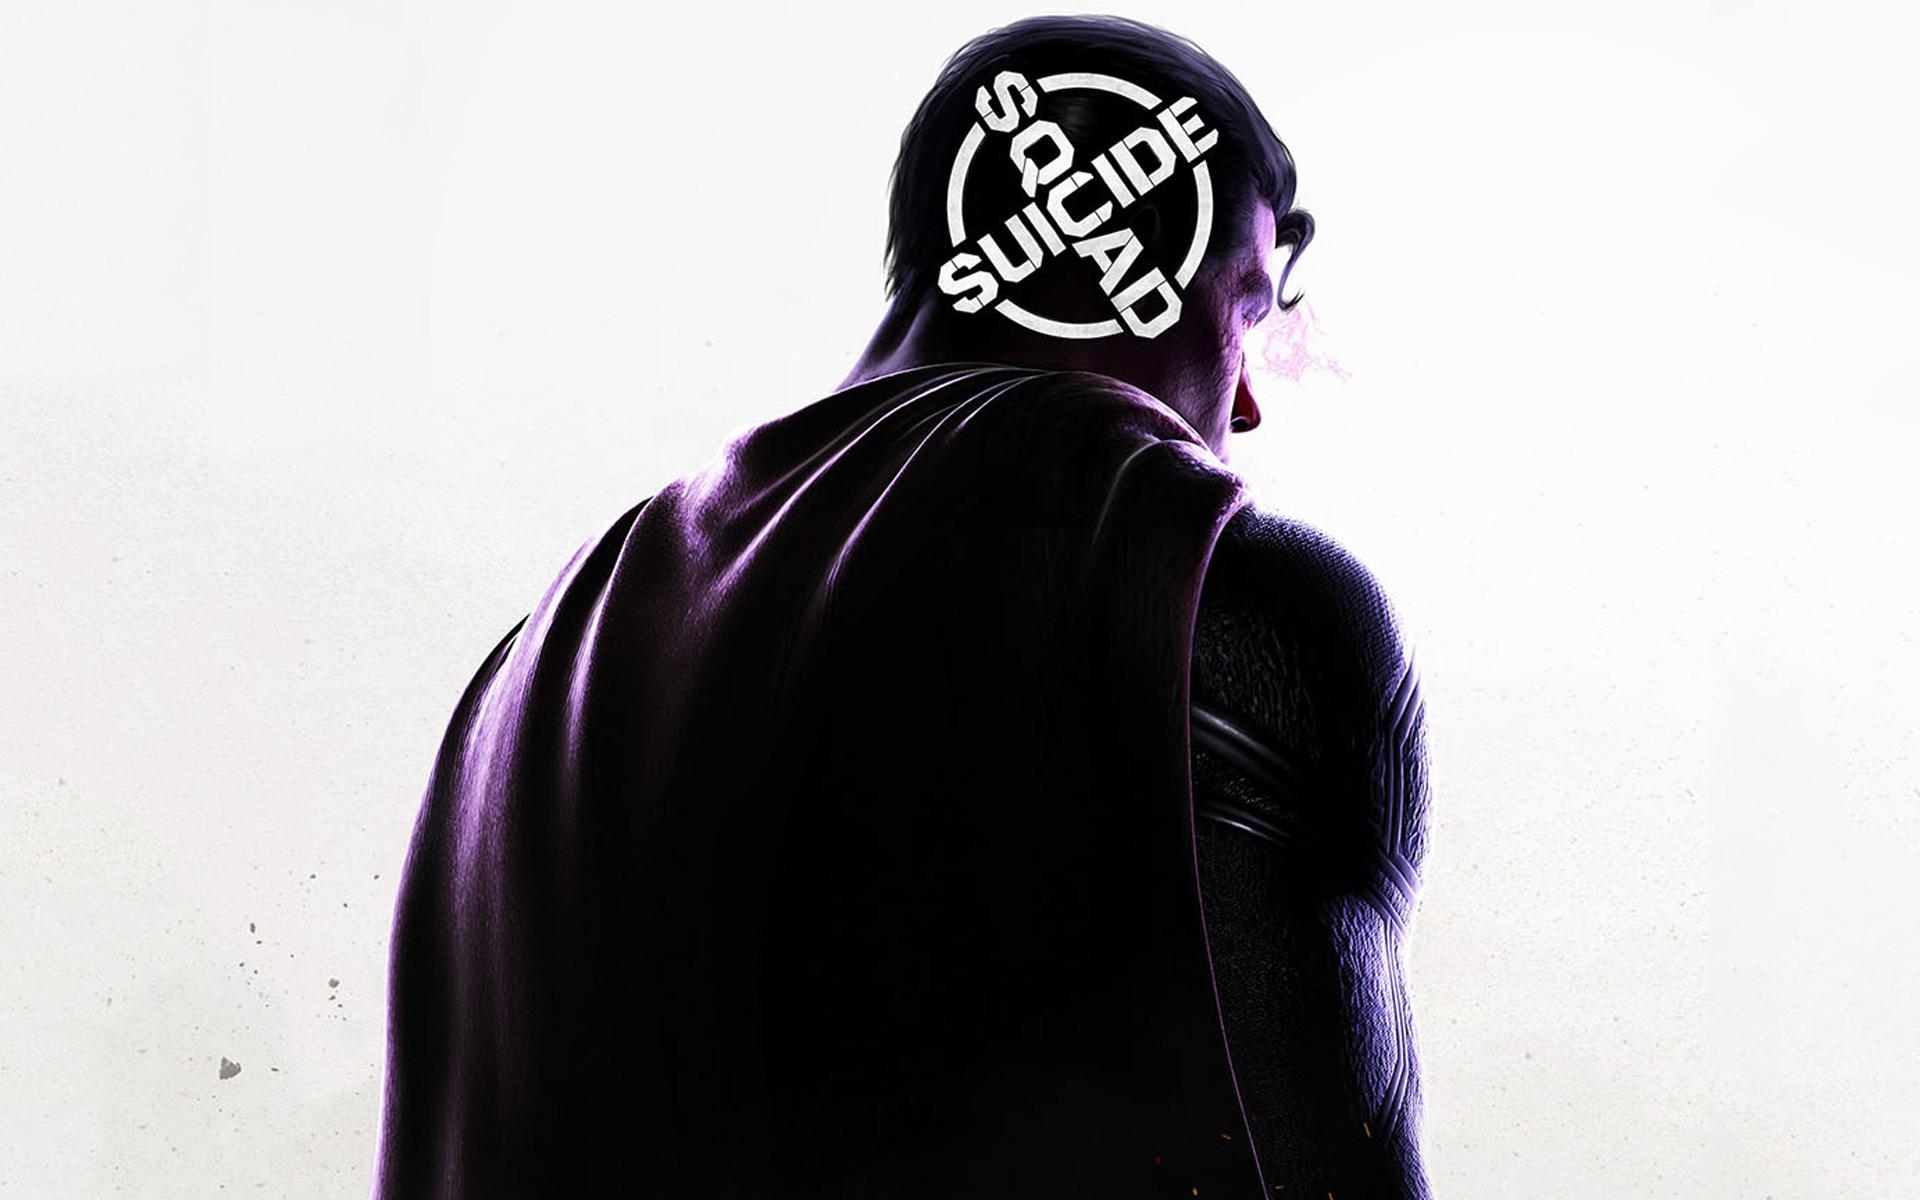 Free Suicide Squad: Kill the Justice League Wallpaper in 1920x1200